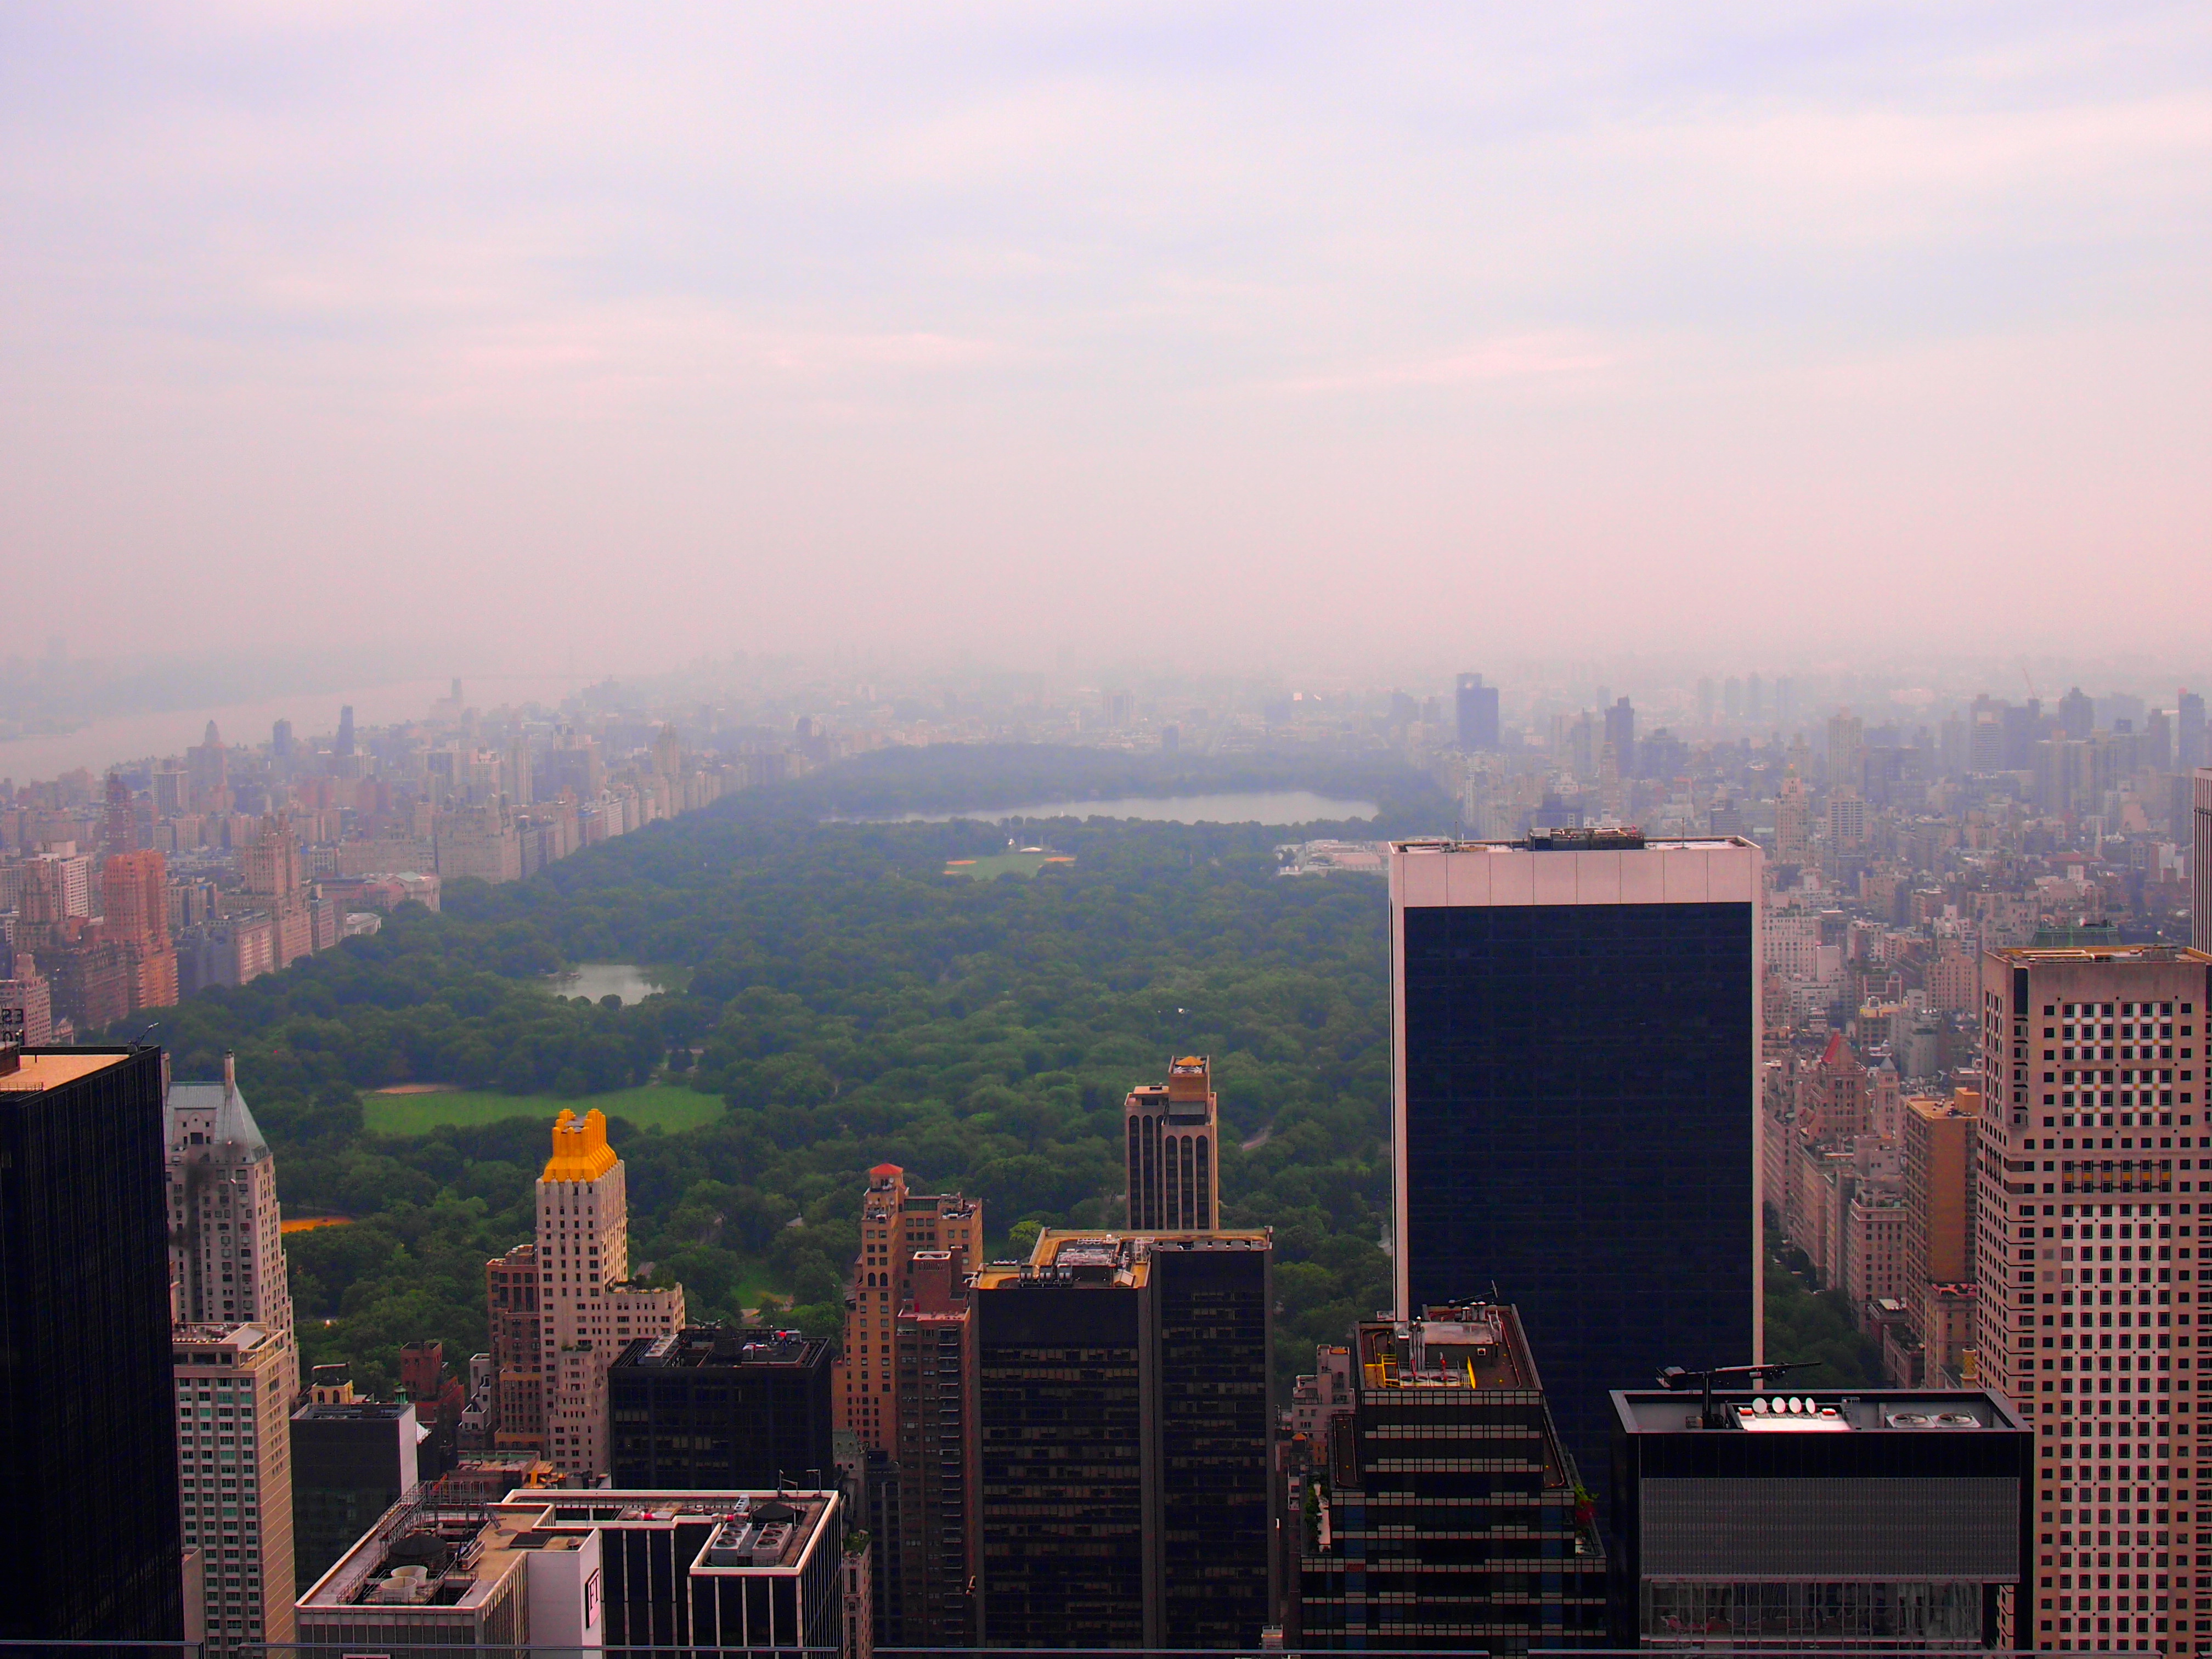 View from Rockefeller Center